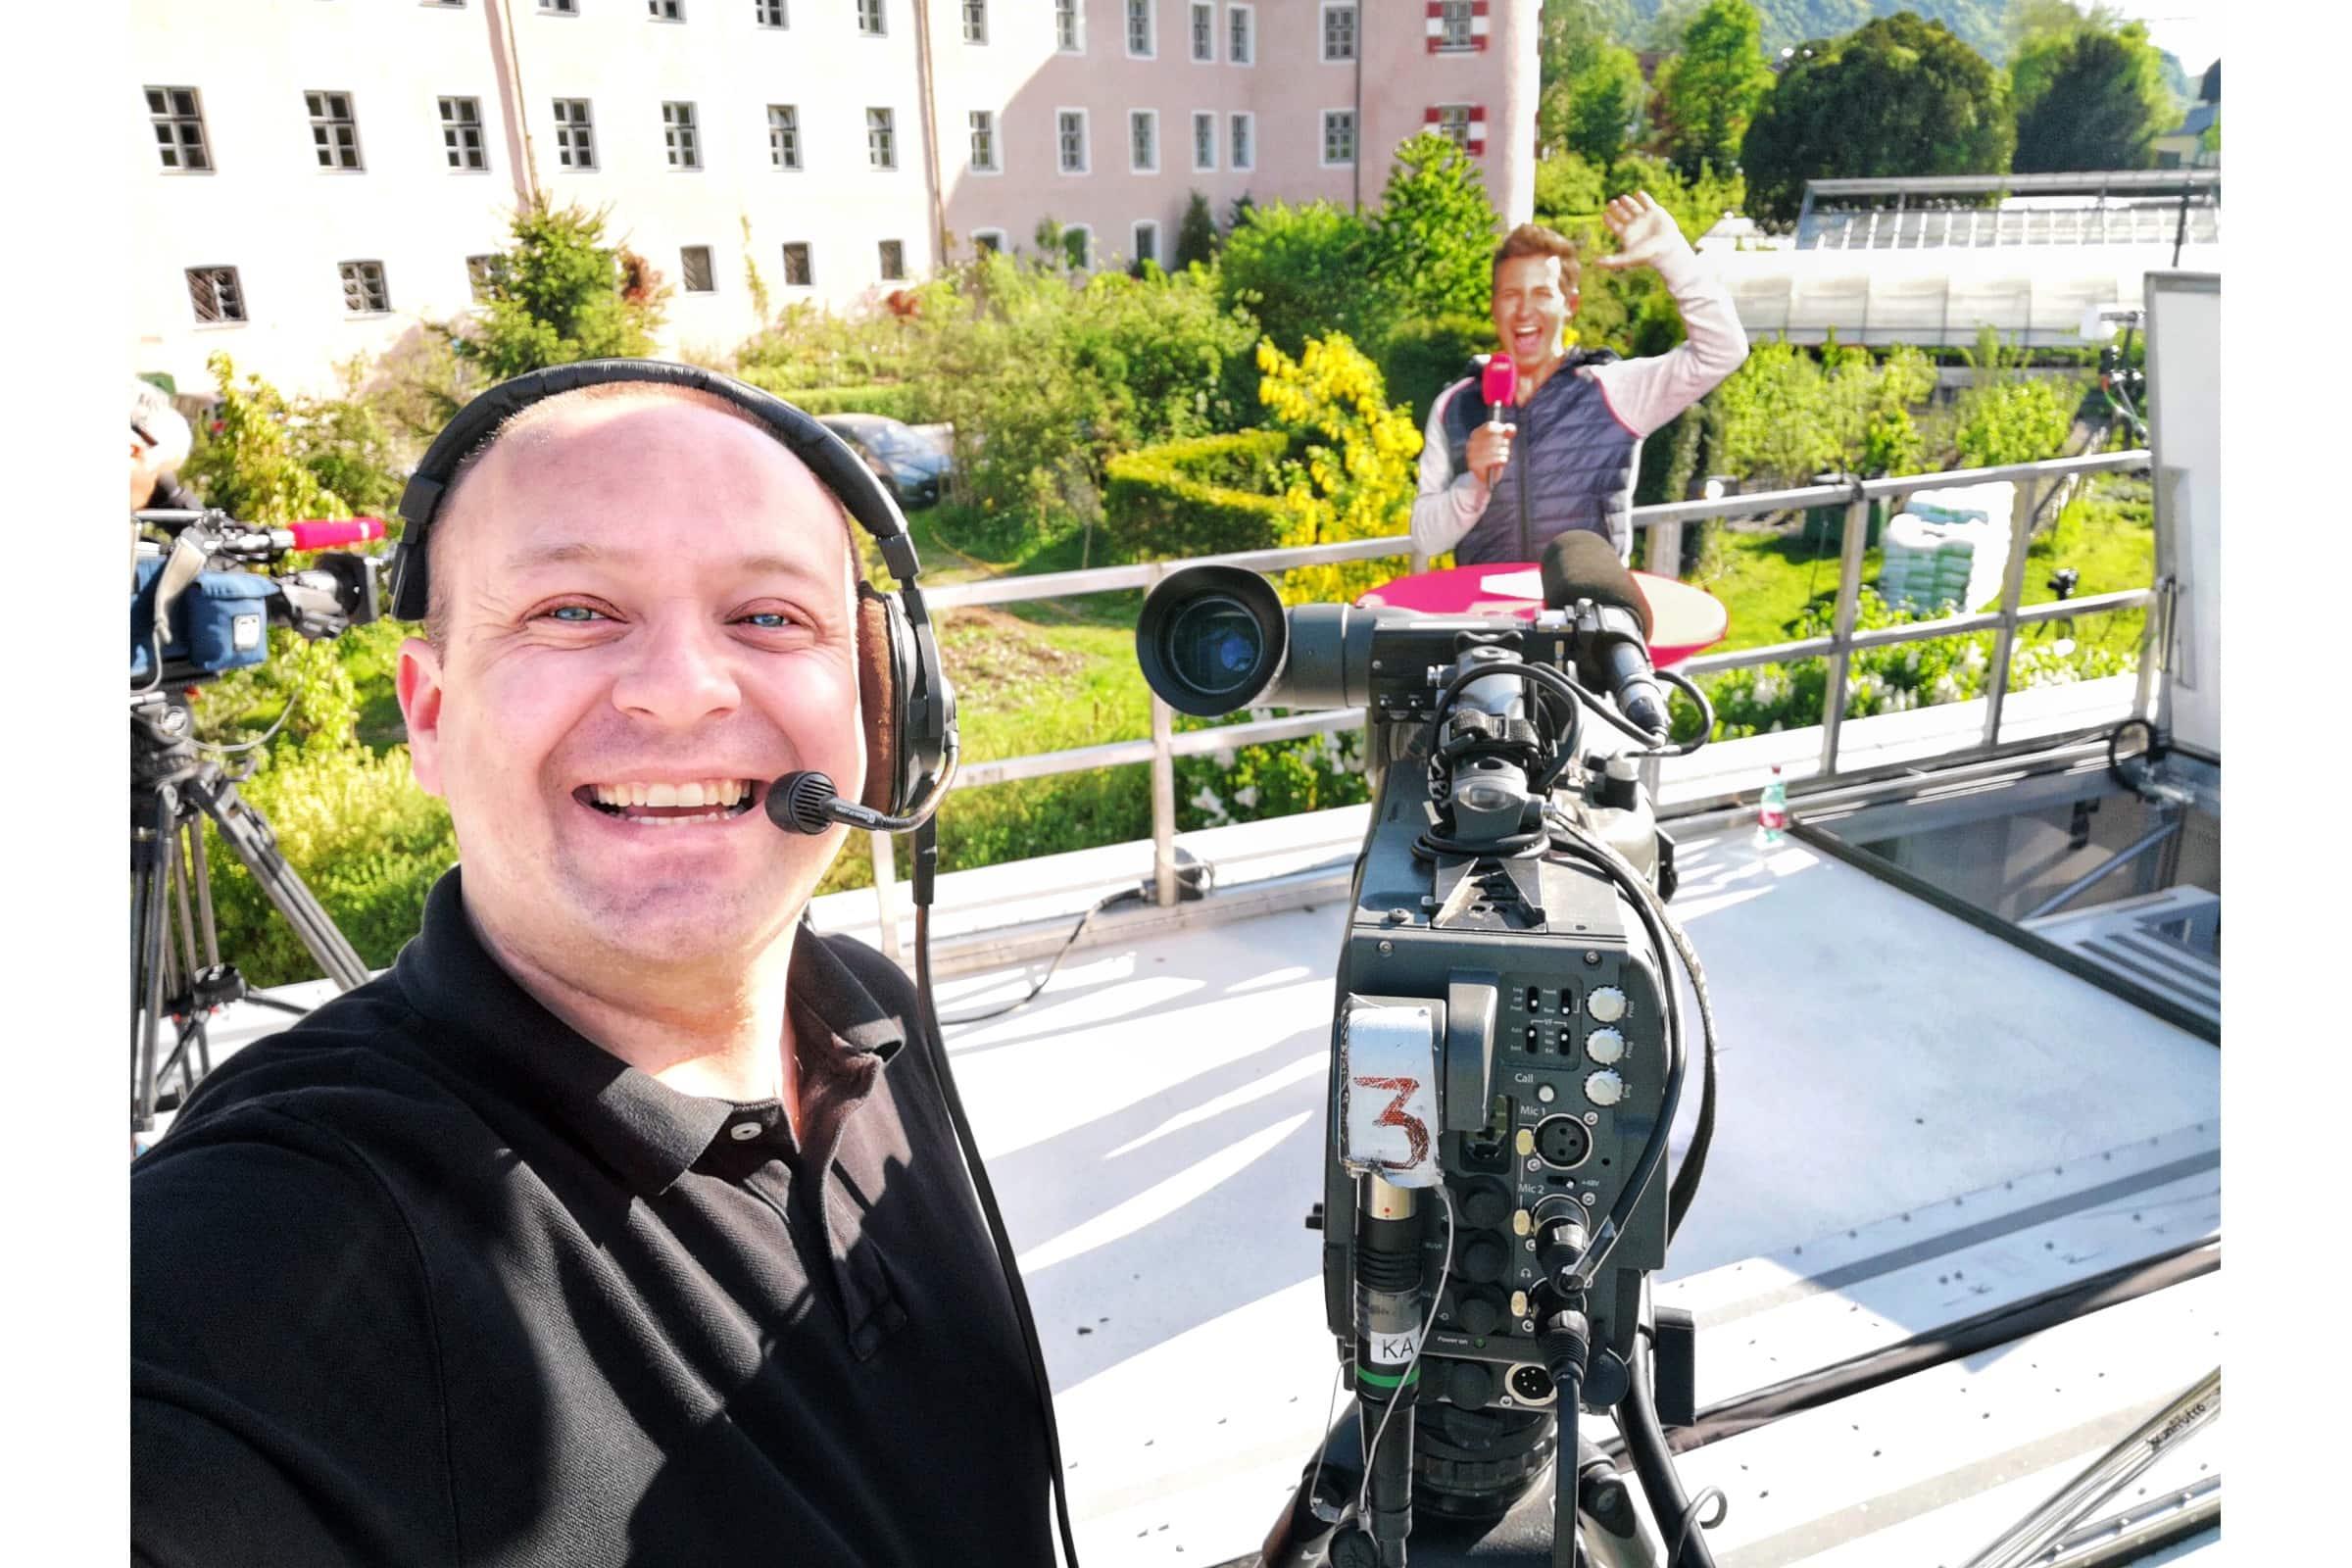 andreas felder kameramann orf unterwegs in österreich 01 30.04.2018 17 21 12 - ORF Unterwegs in Österreich - Tirol